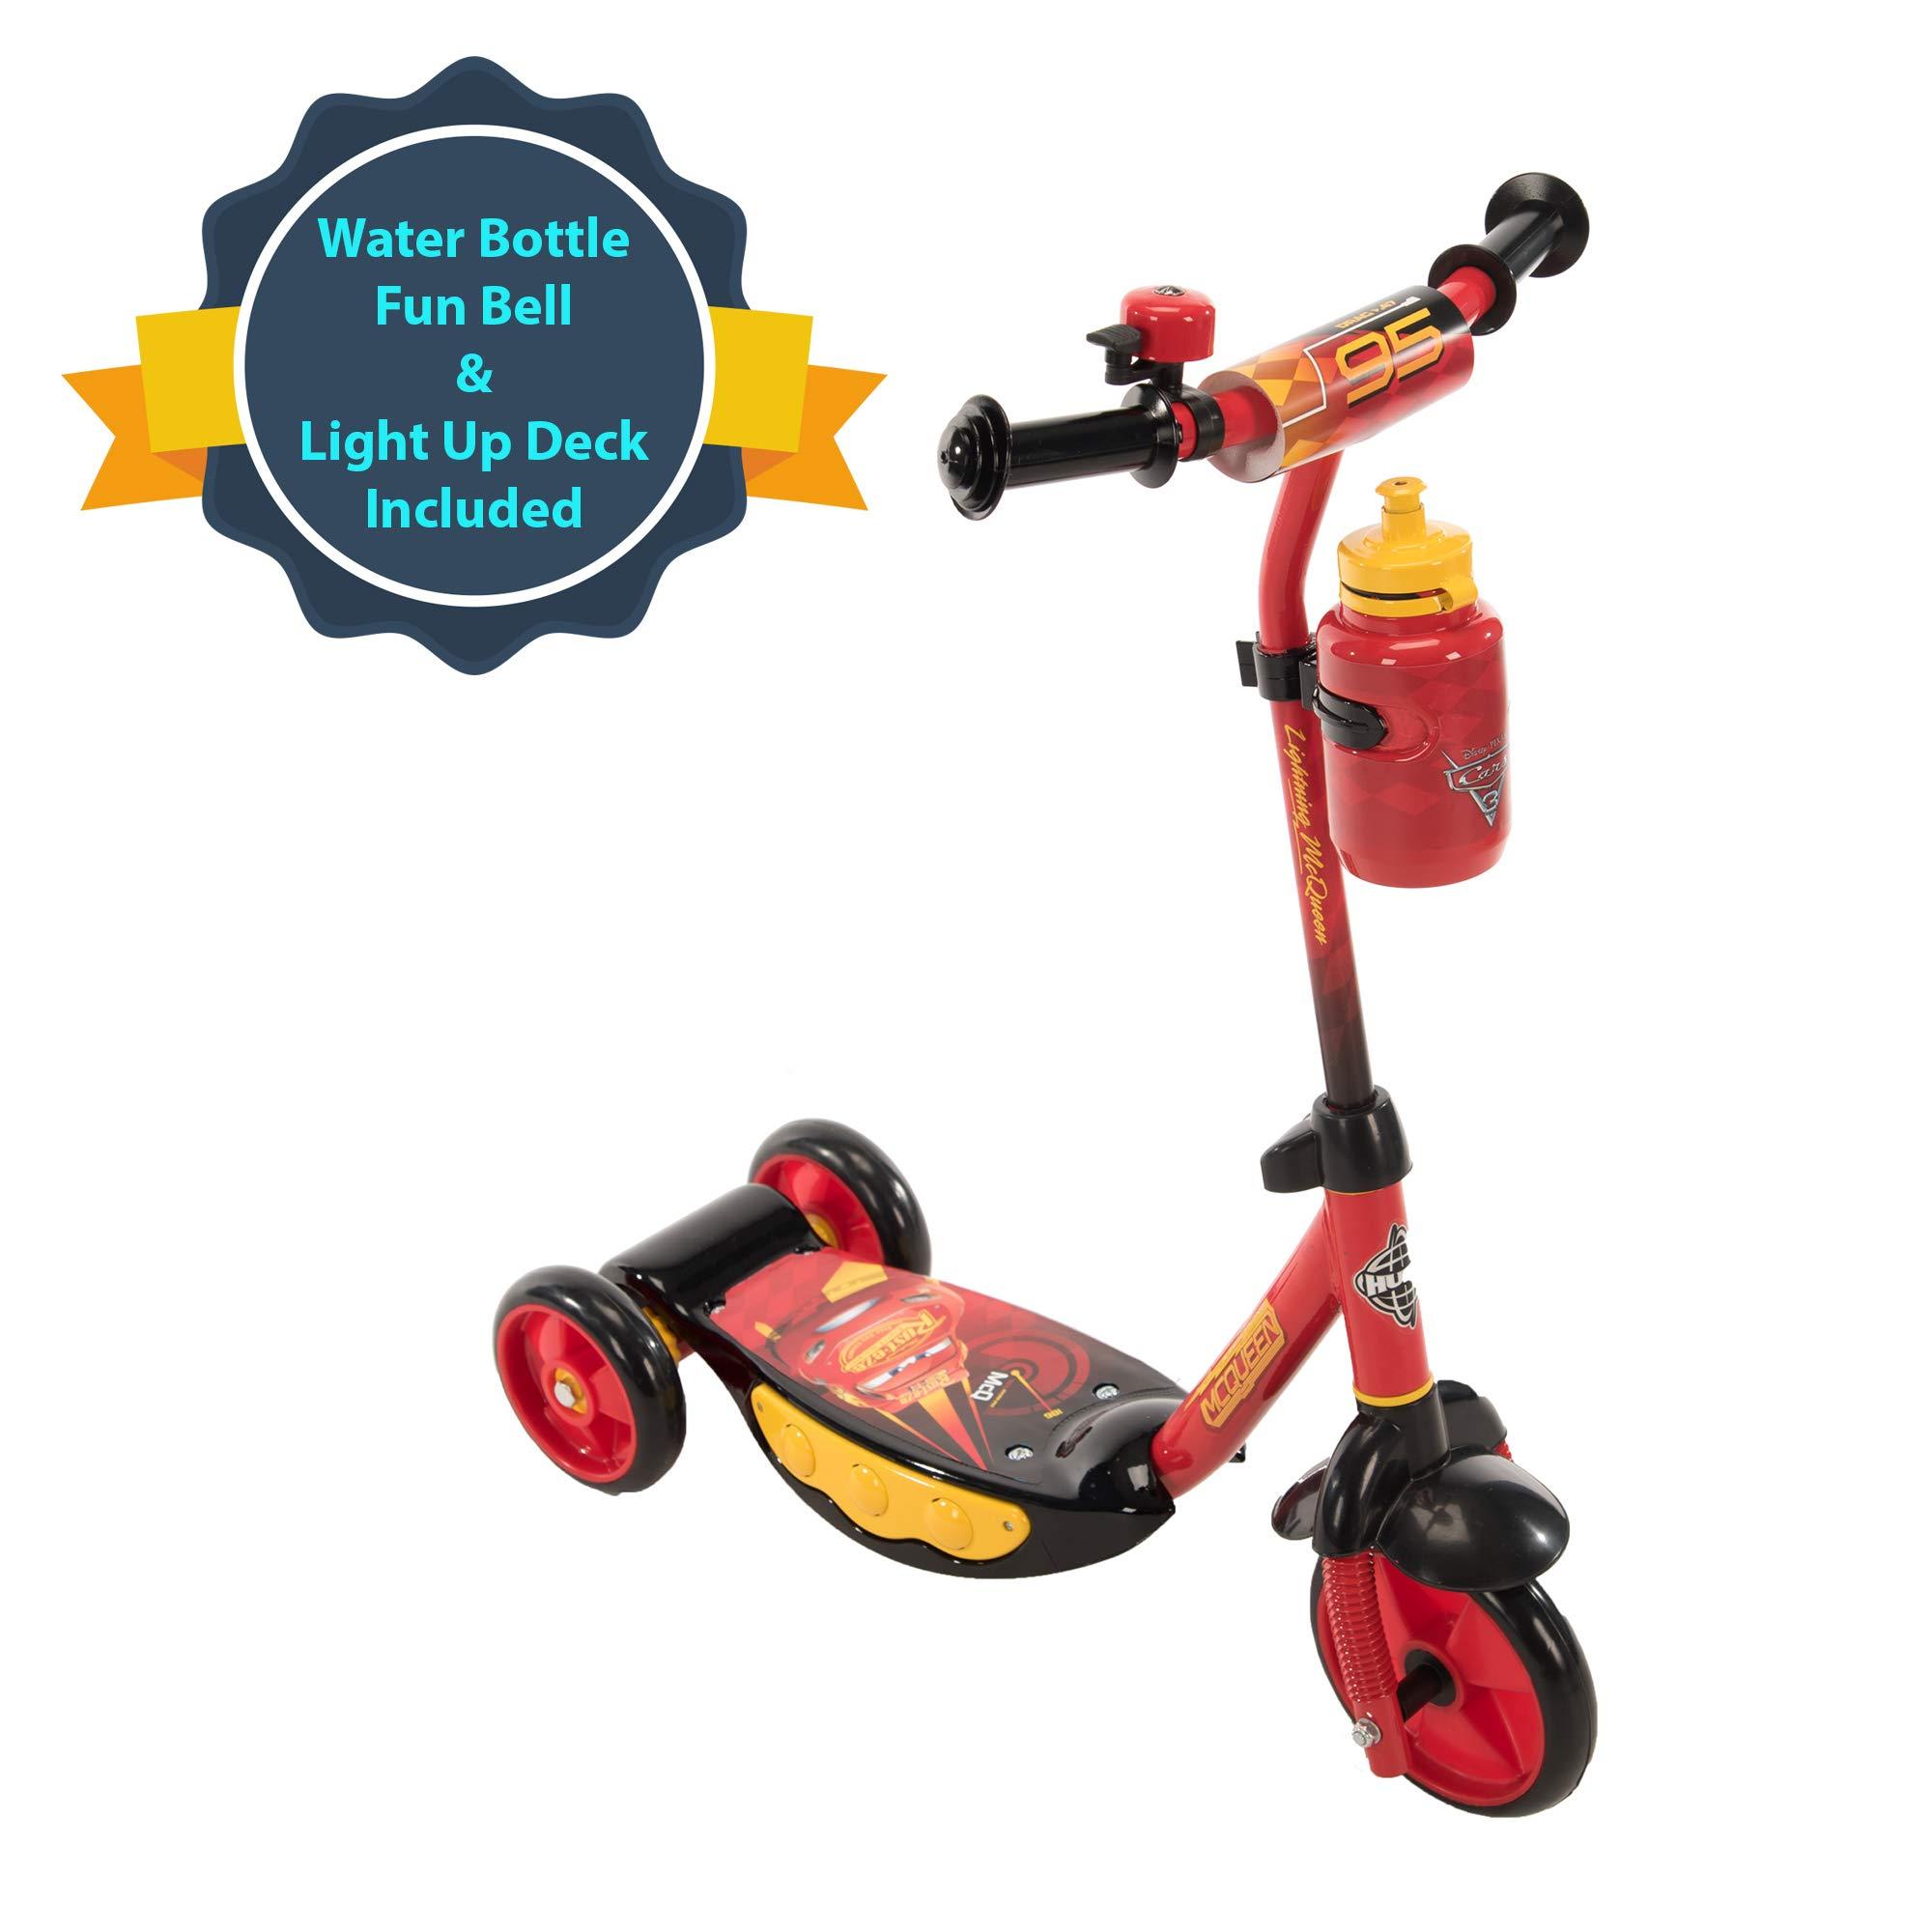 Huffy Disney Pixar Cars Preschool Scooter with Lights, Bell & A Water Bottle Superhero Red, Pixar Cars with Lights & Water Bottle by Huffy